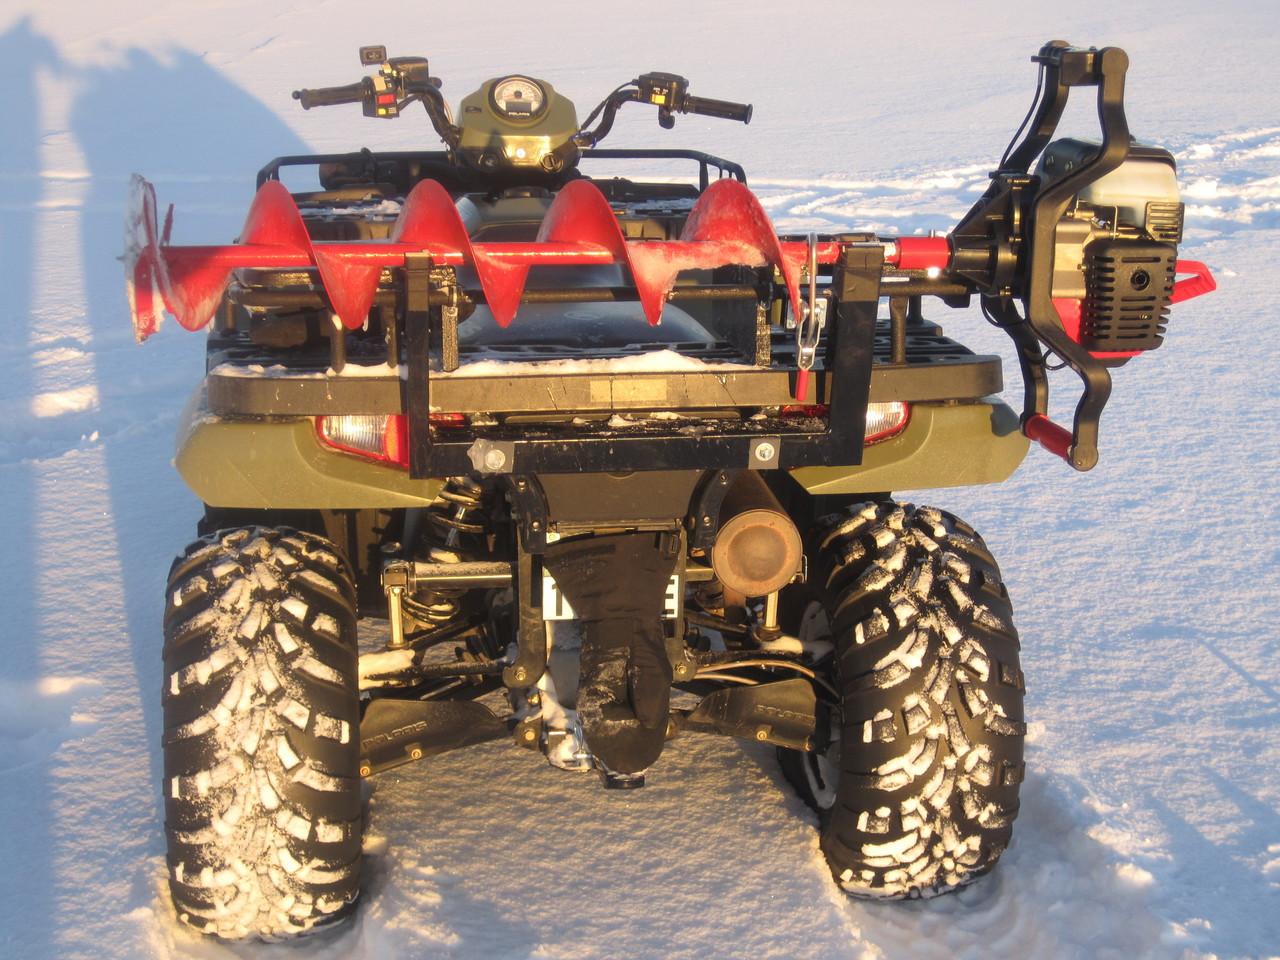 Ice Auger Carrier for snowmobile -  jiffy, eskimo, nils master strikemaster